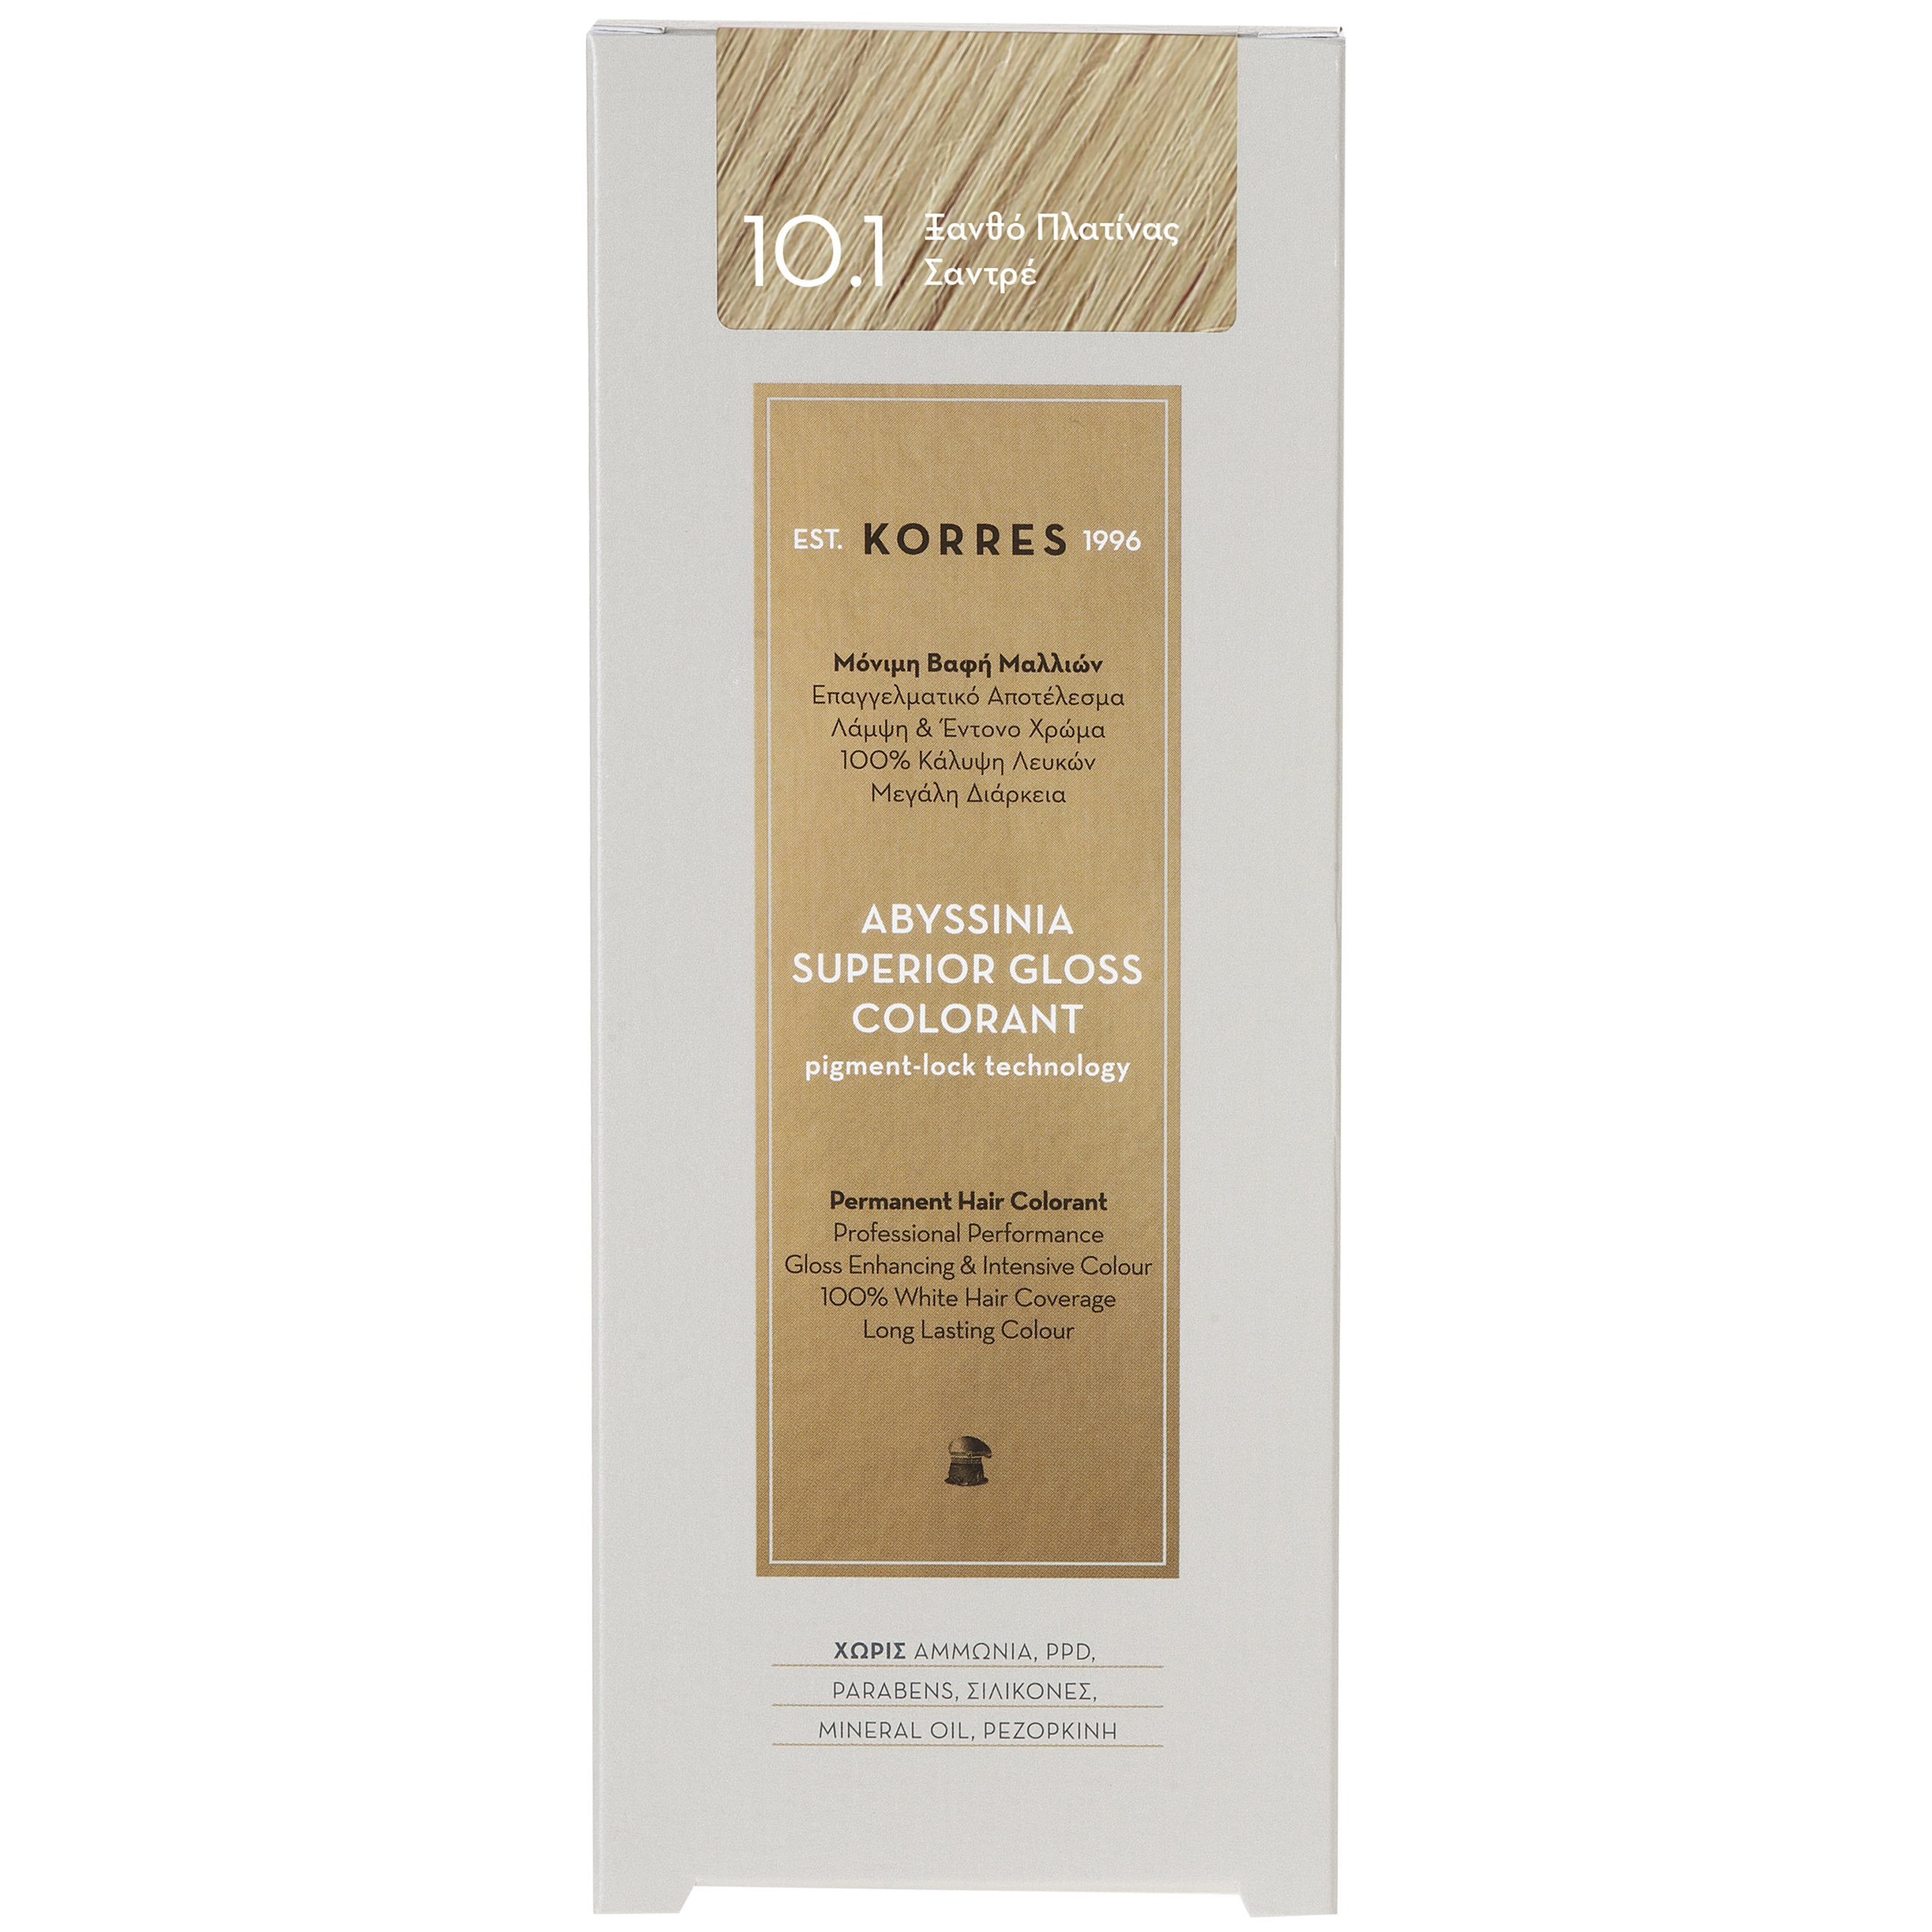 Korres Abyssinia Superior Gloss Colorant Επαγγελματικό Αποτέλεσμα Λάμψη & Έντονο Χρώμα – 10.1 ΞΑΝΘΟ ΠΛΑΤΙΝΑΣ ΣΑΝΤΡΕ